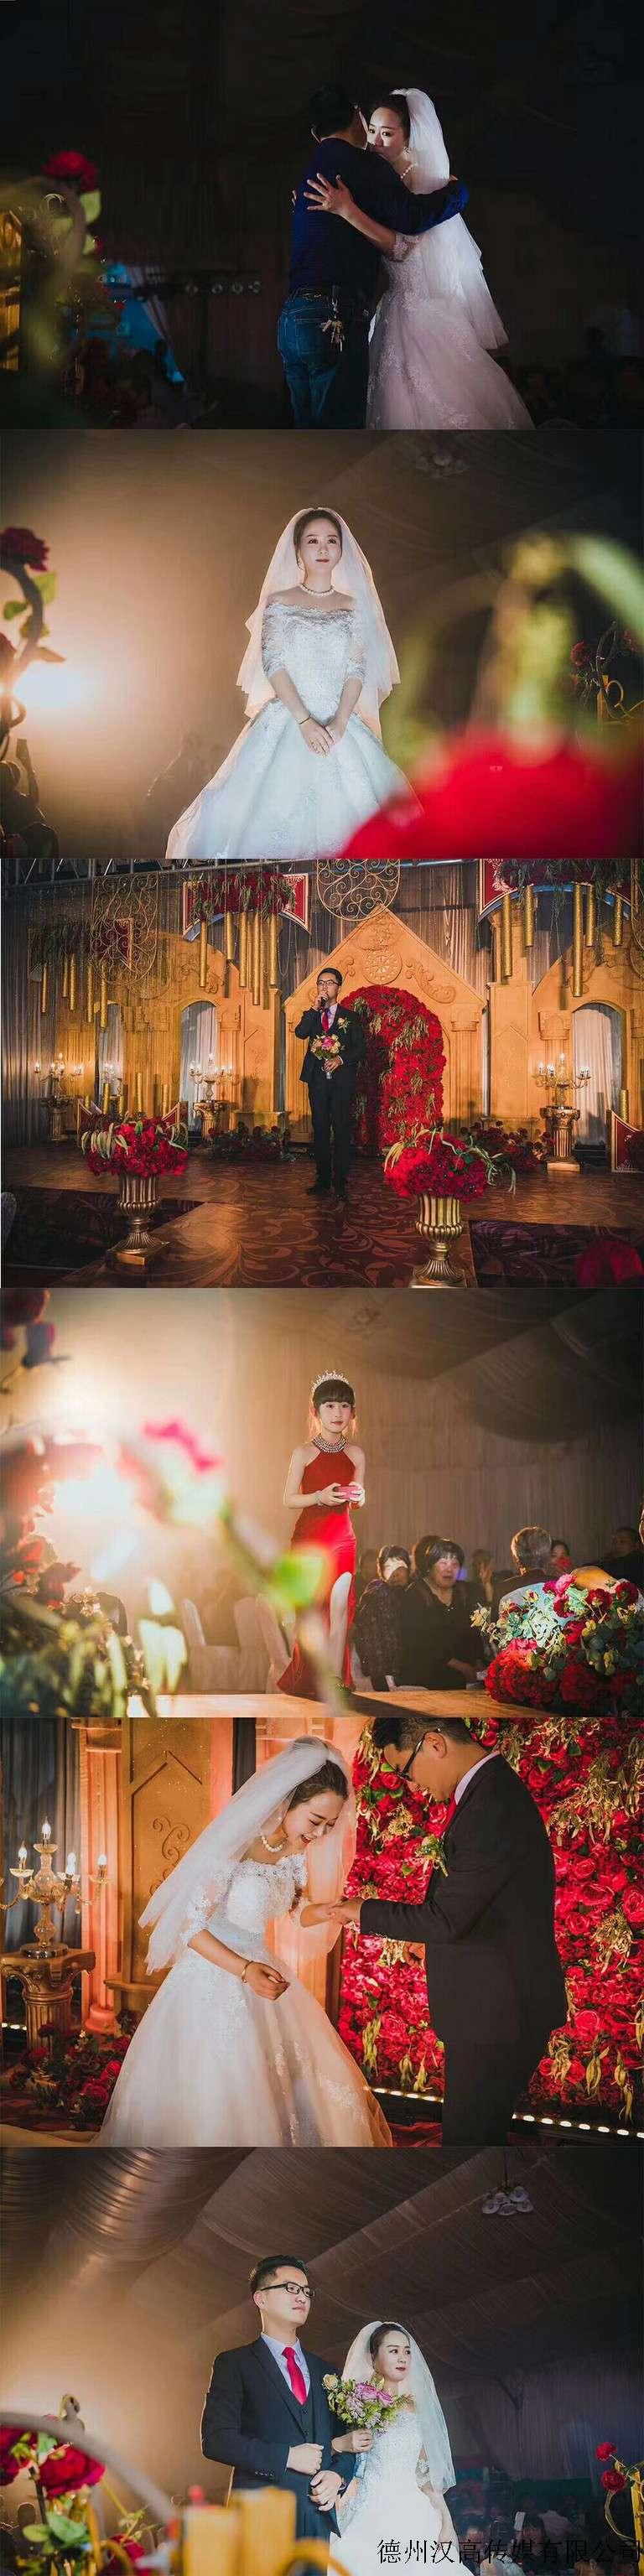 婚禮7.jpg